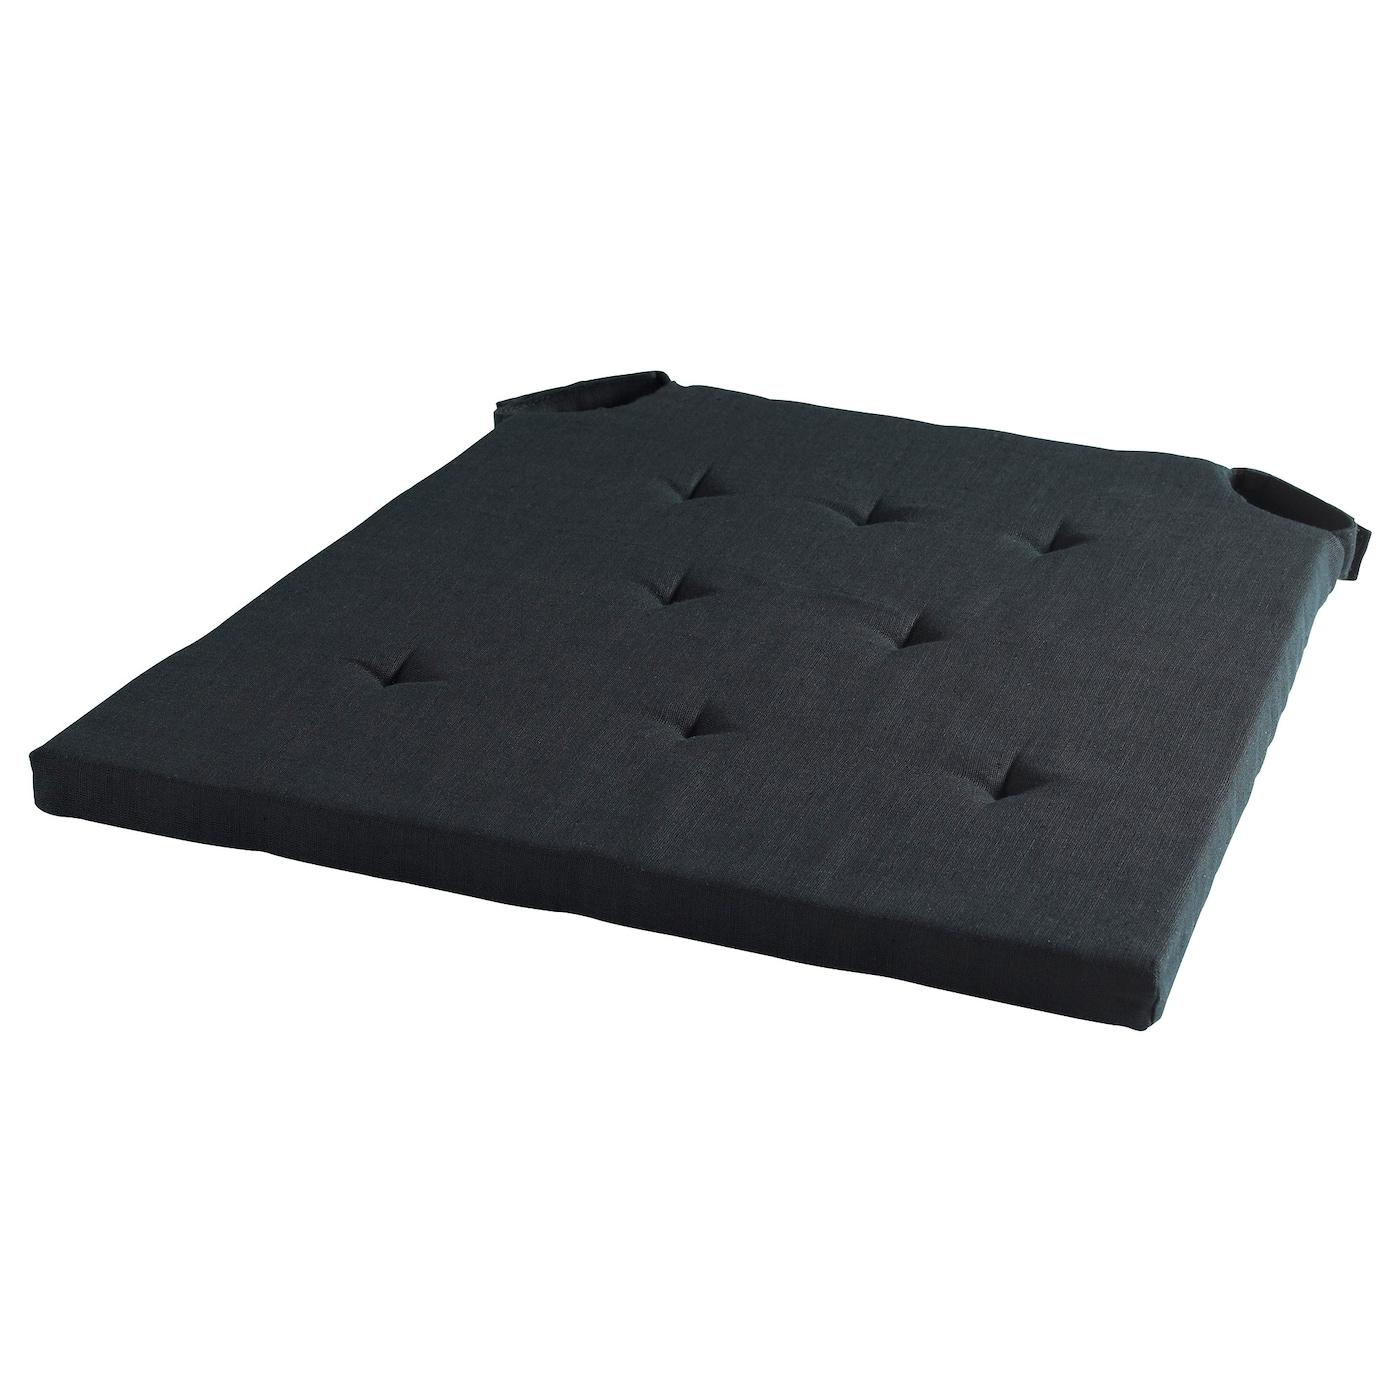 ADMETE Chair pad Black 43 36x42x2 5 cm IKEA